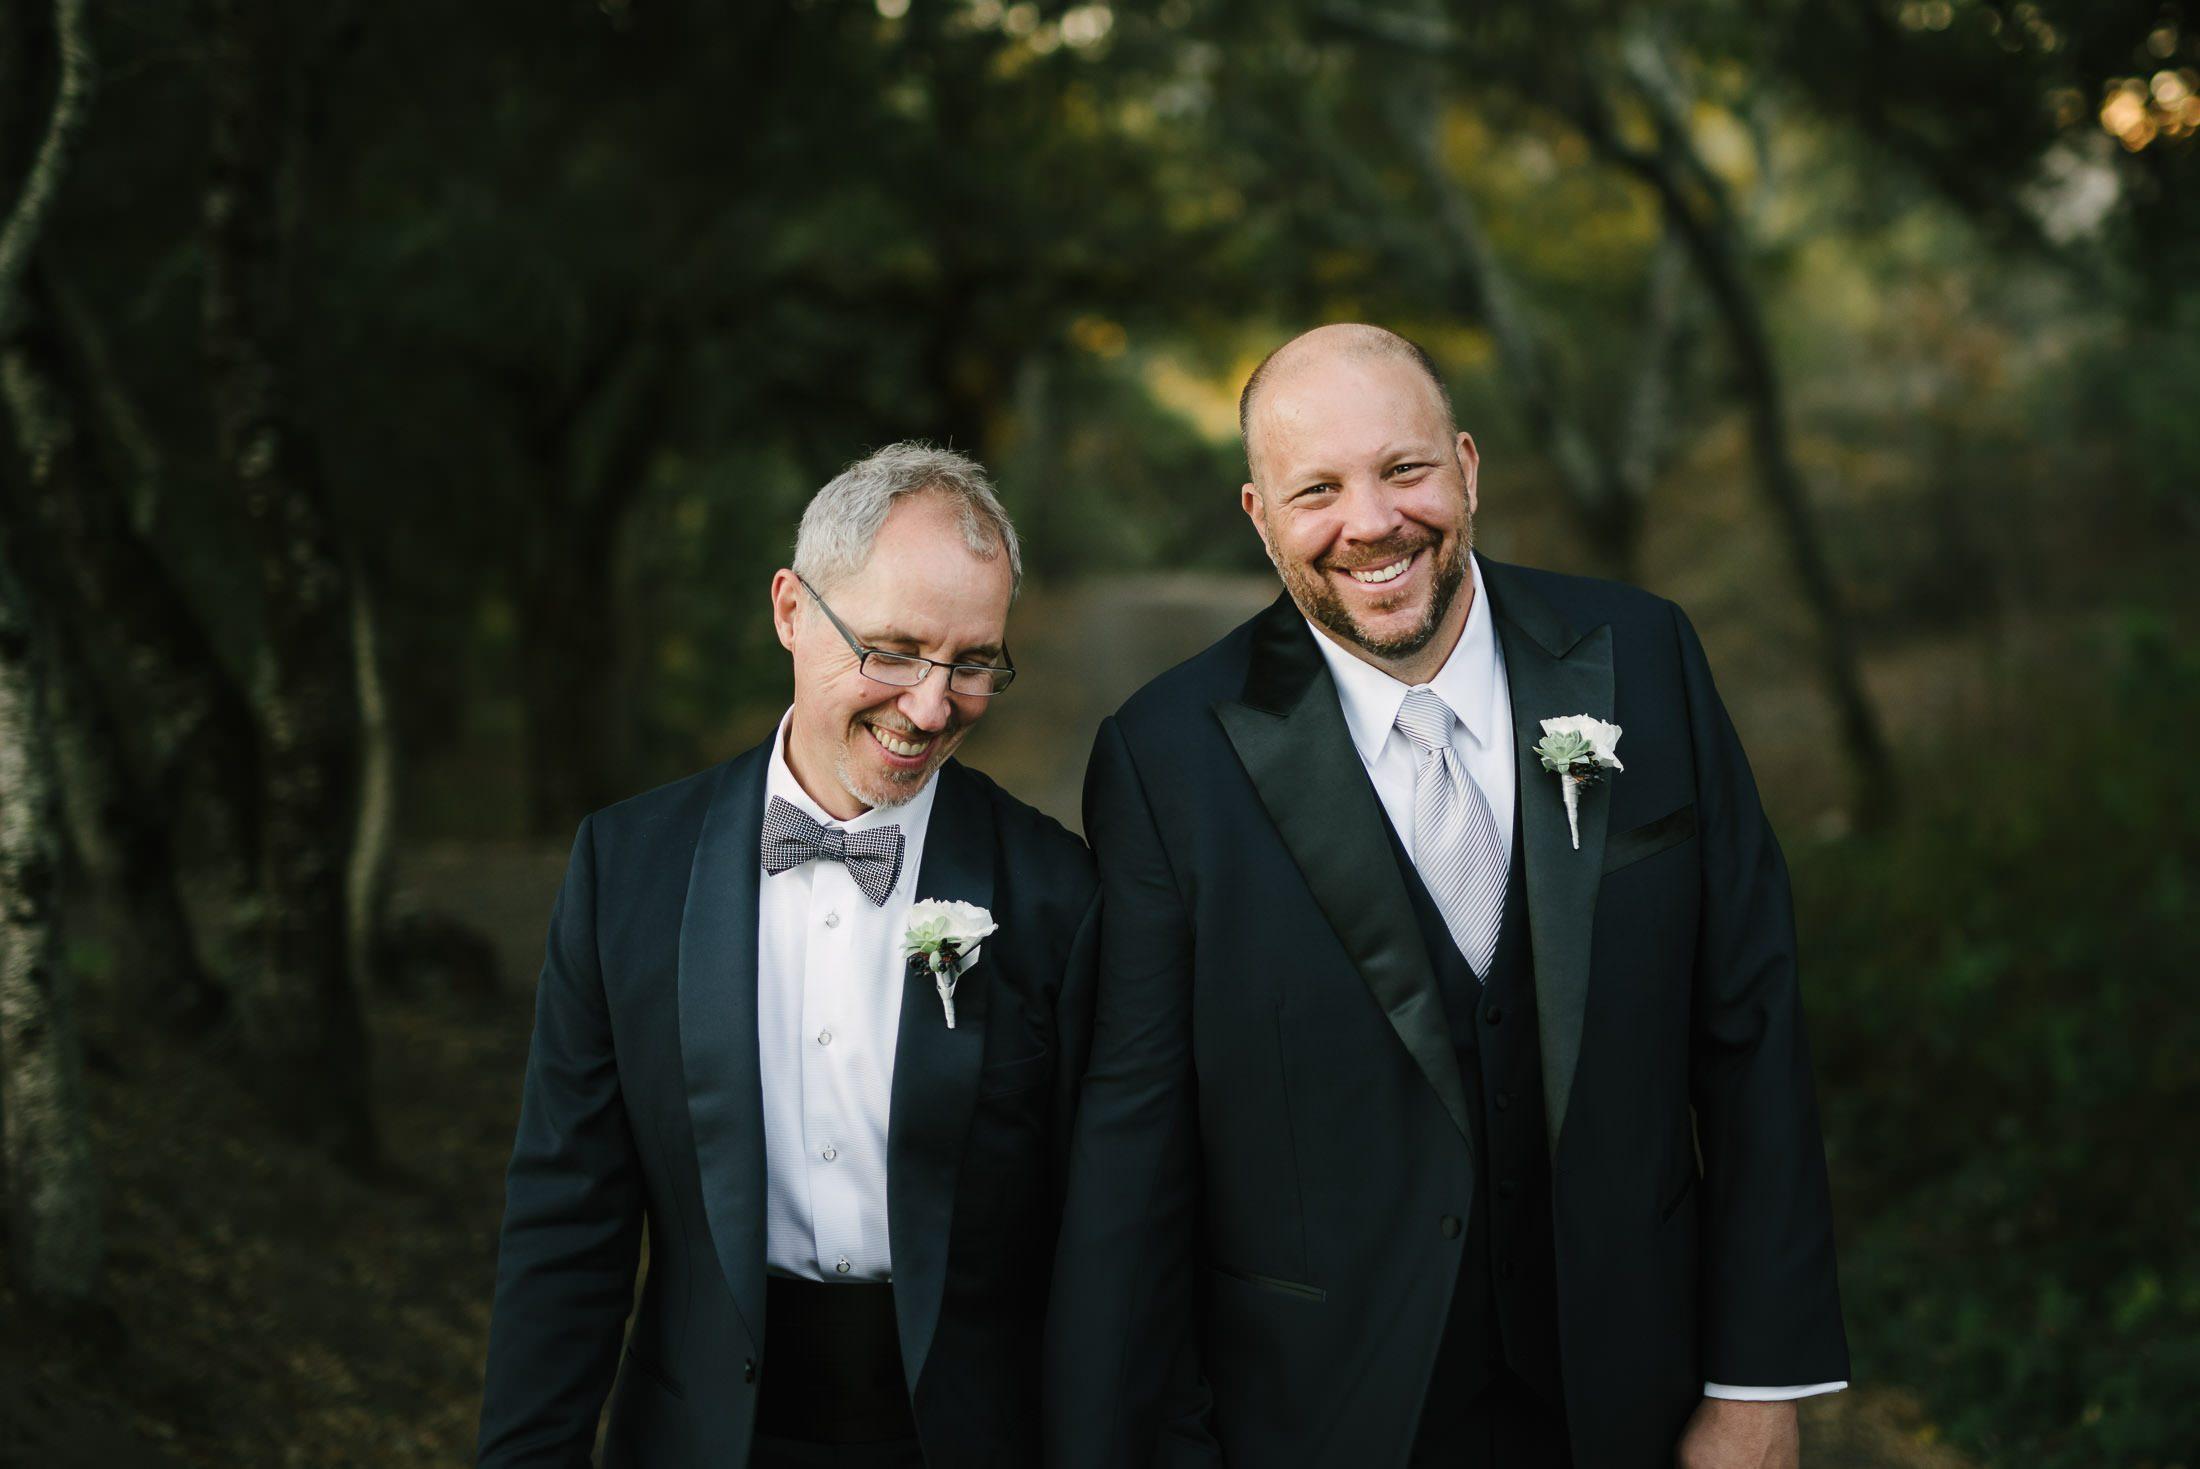 Gay Couple Laughing at Wedding